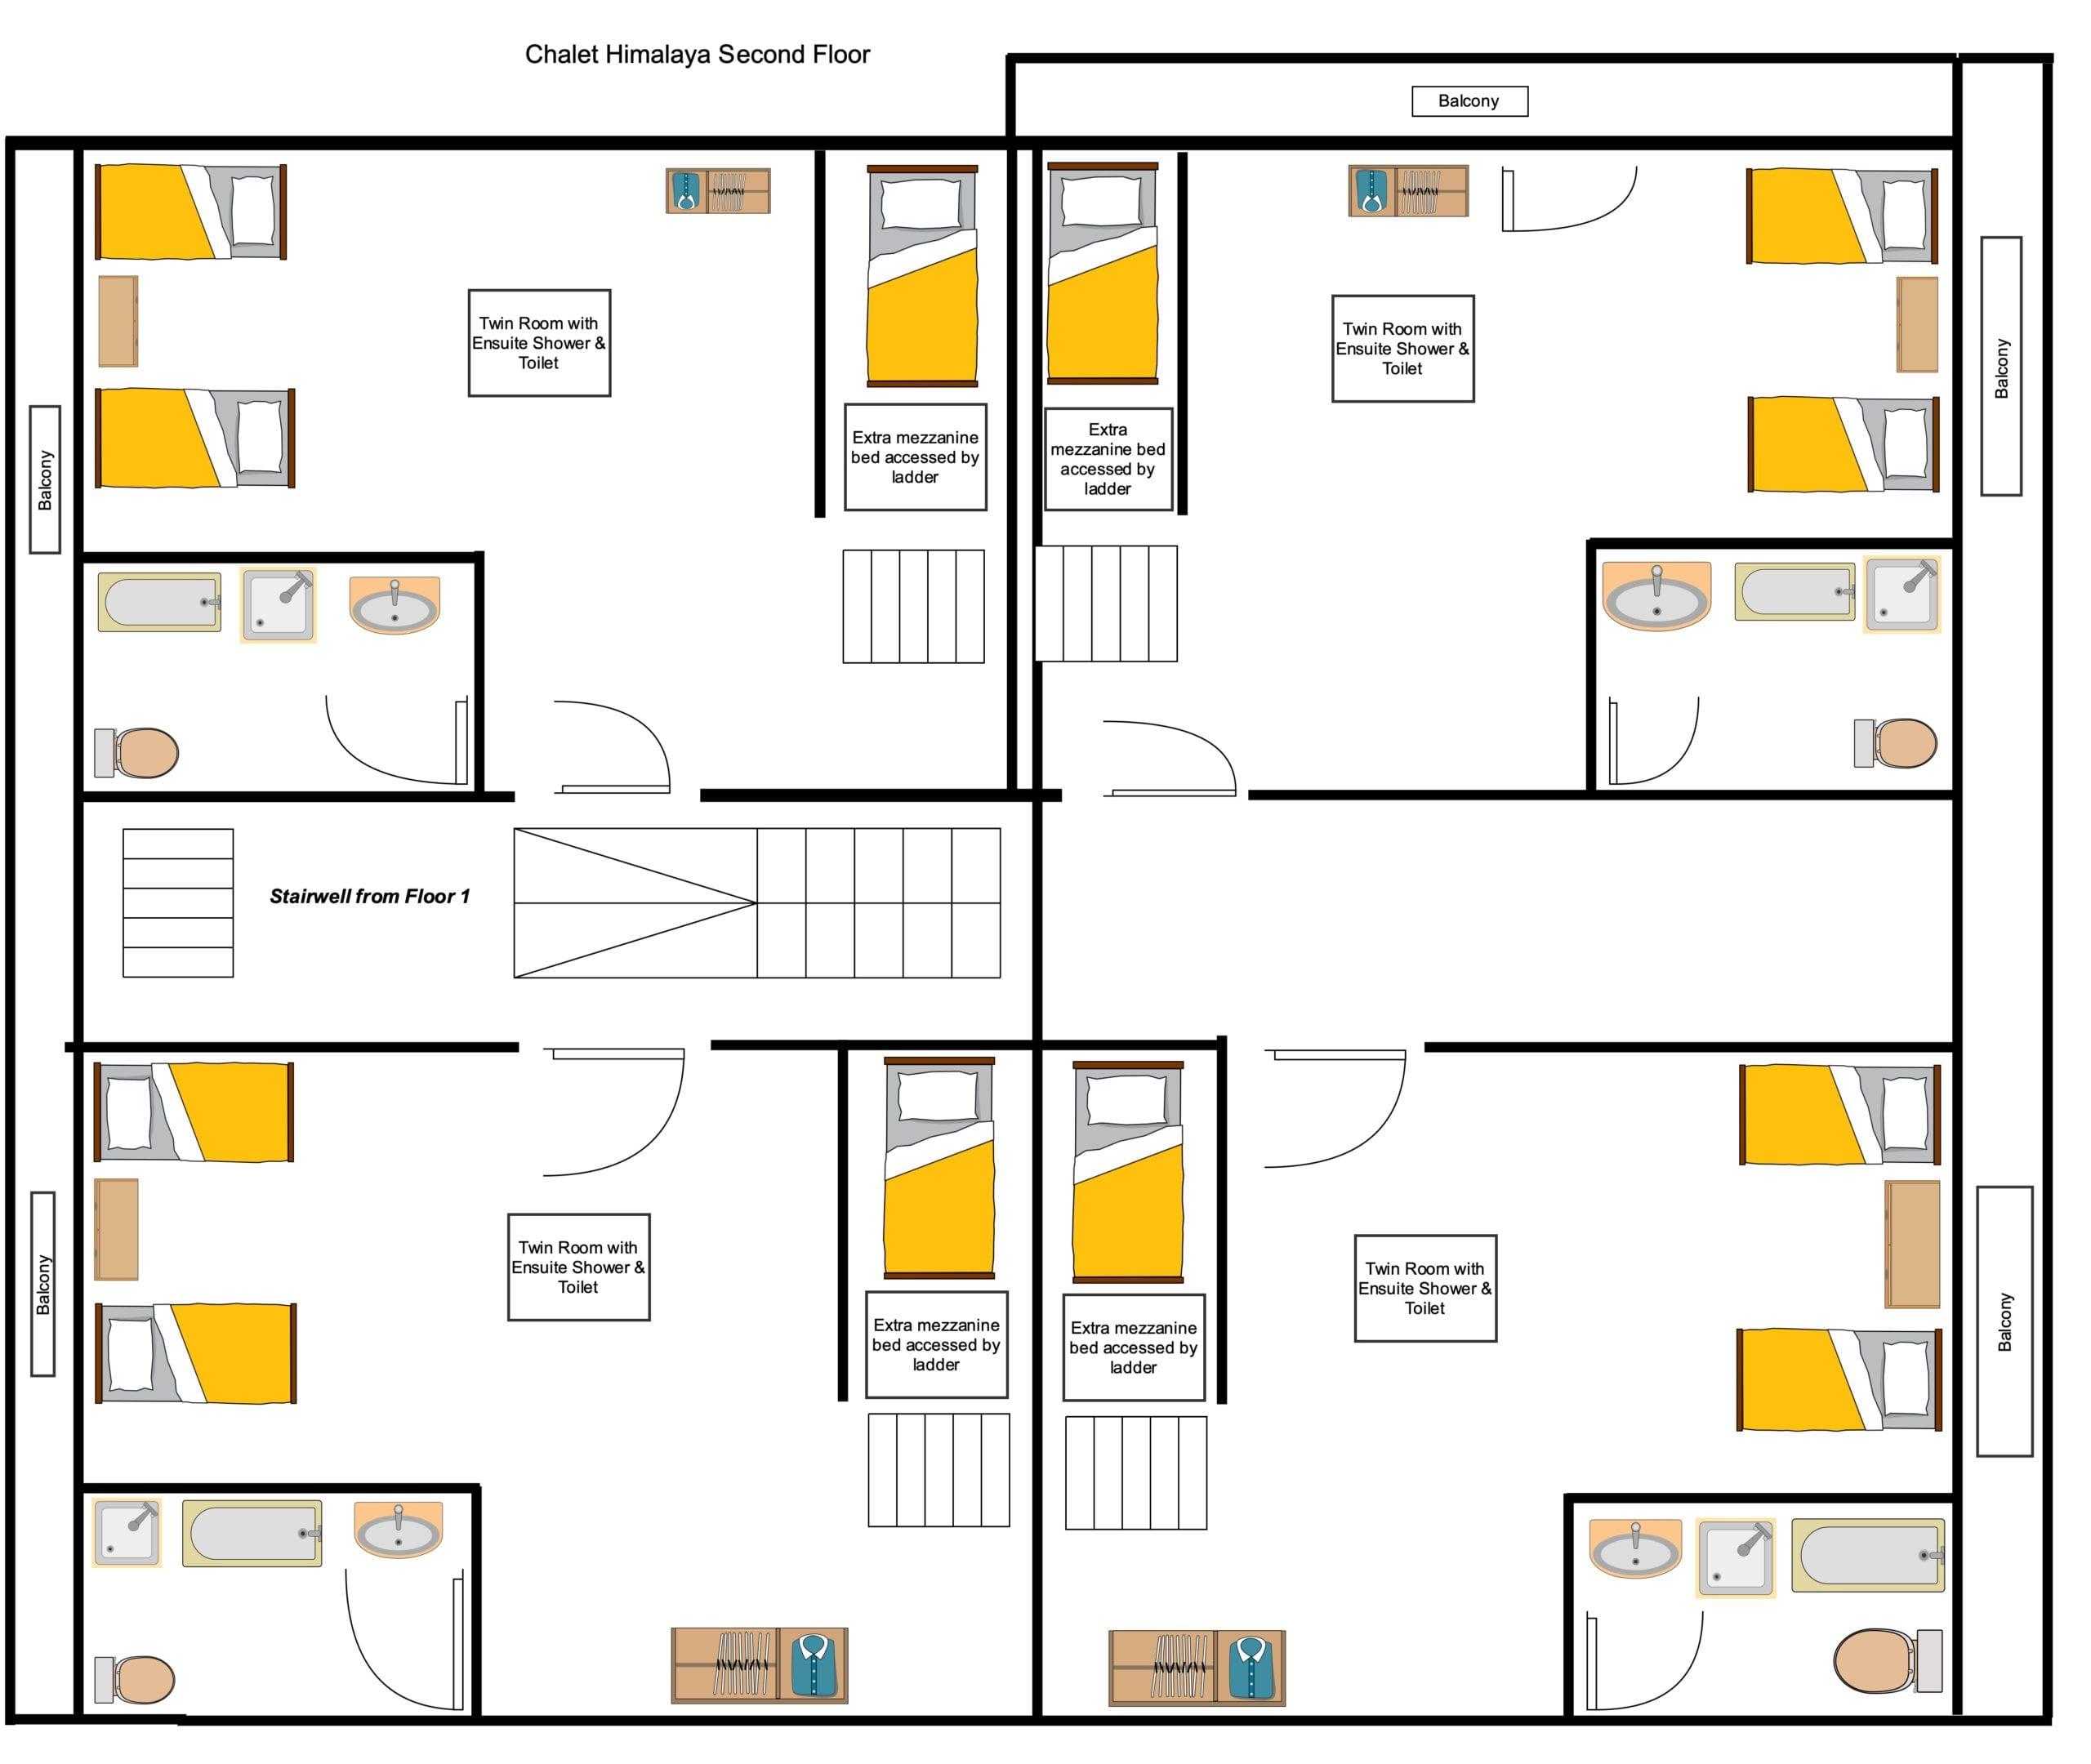 Chalet Himalaya - Second Floor Floorplan